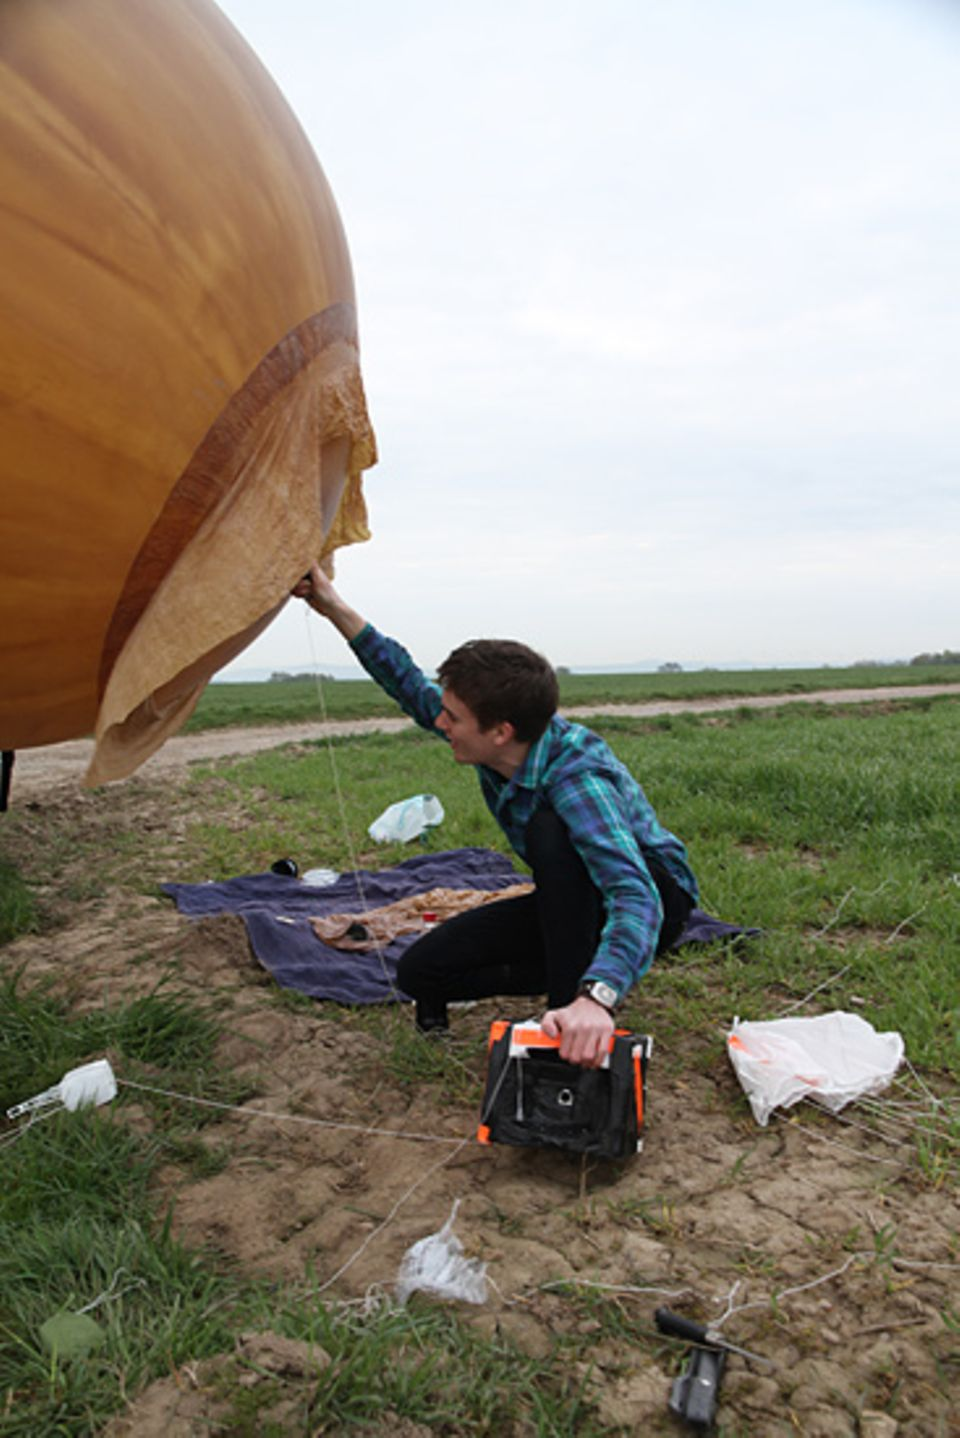 Space Ballon: Ein letztes Mal überprüft Tobias ob alles startklar ist